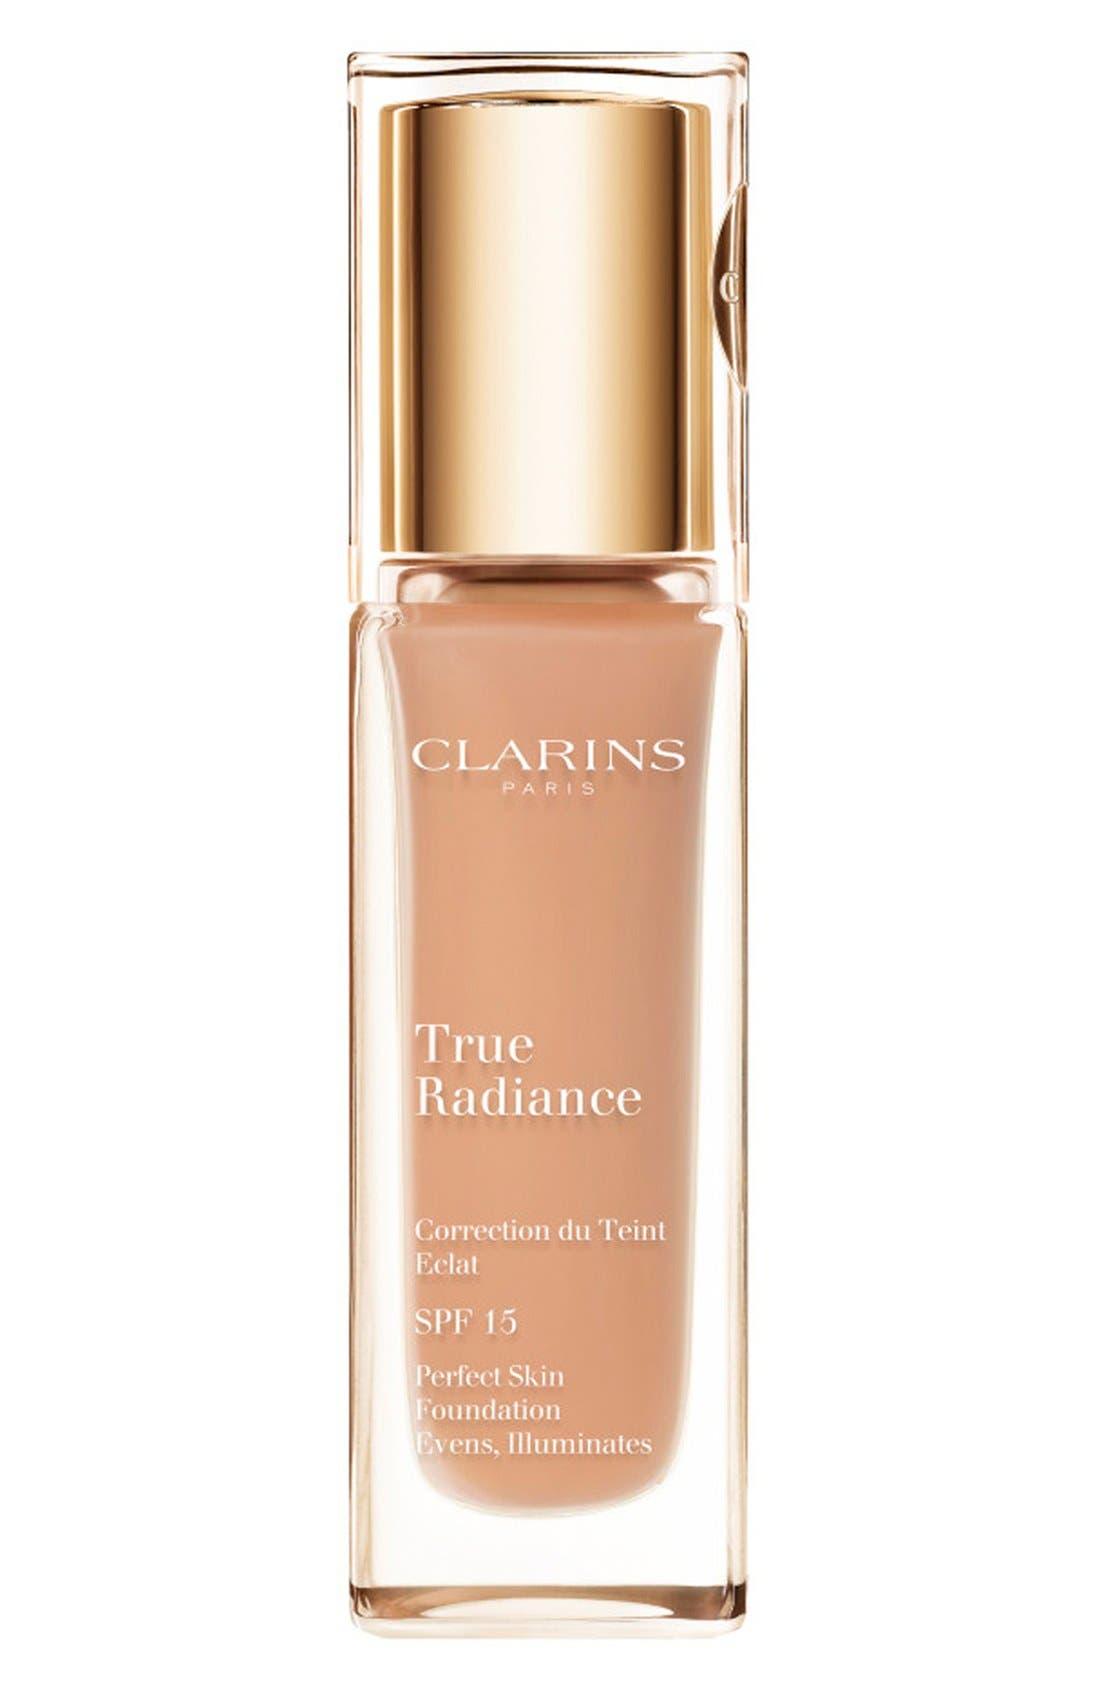 Clarins 'True Radiance' SPF 15 Perfect Skin Foundation